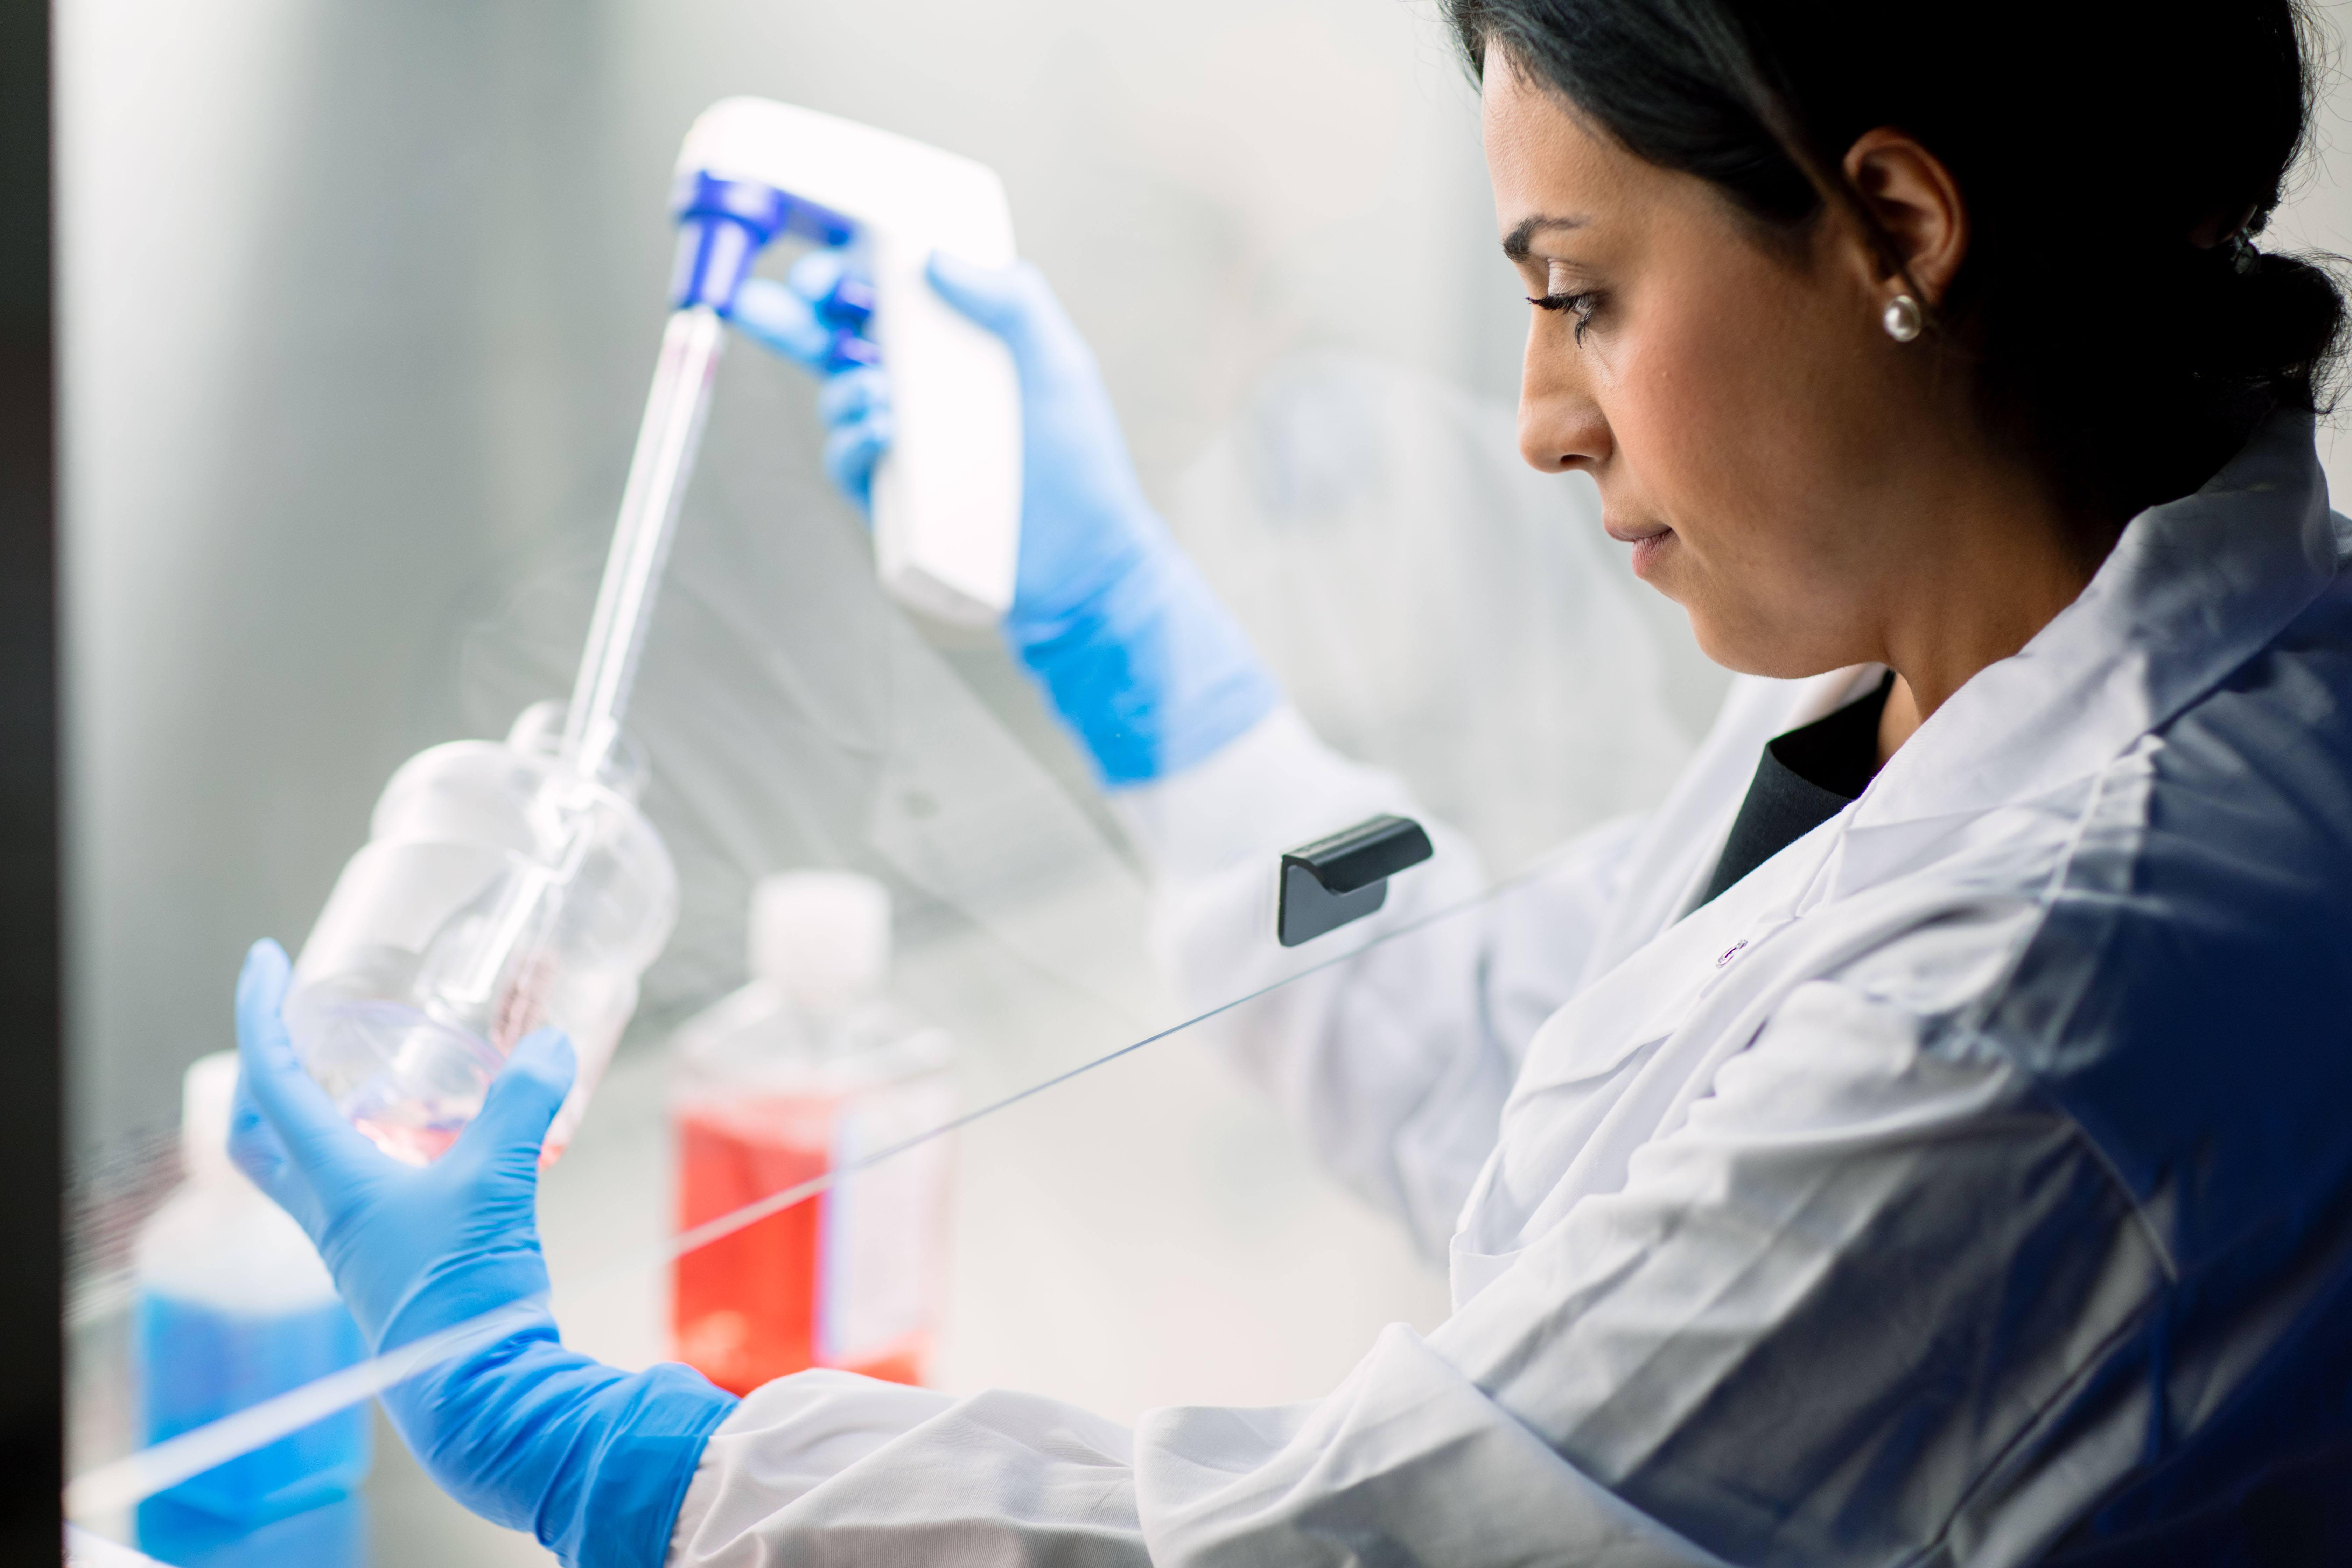 regenerative medicine researcher pipetting stem cells